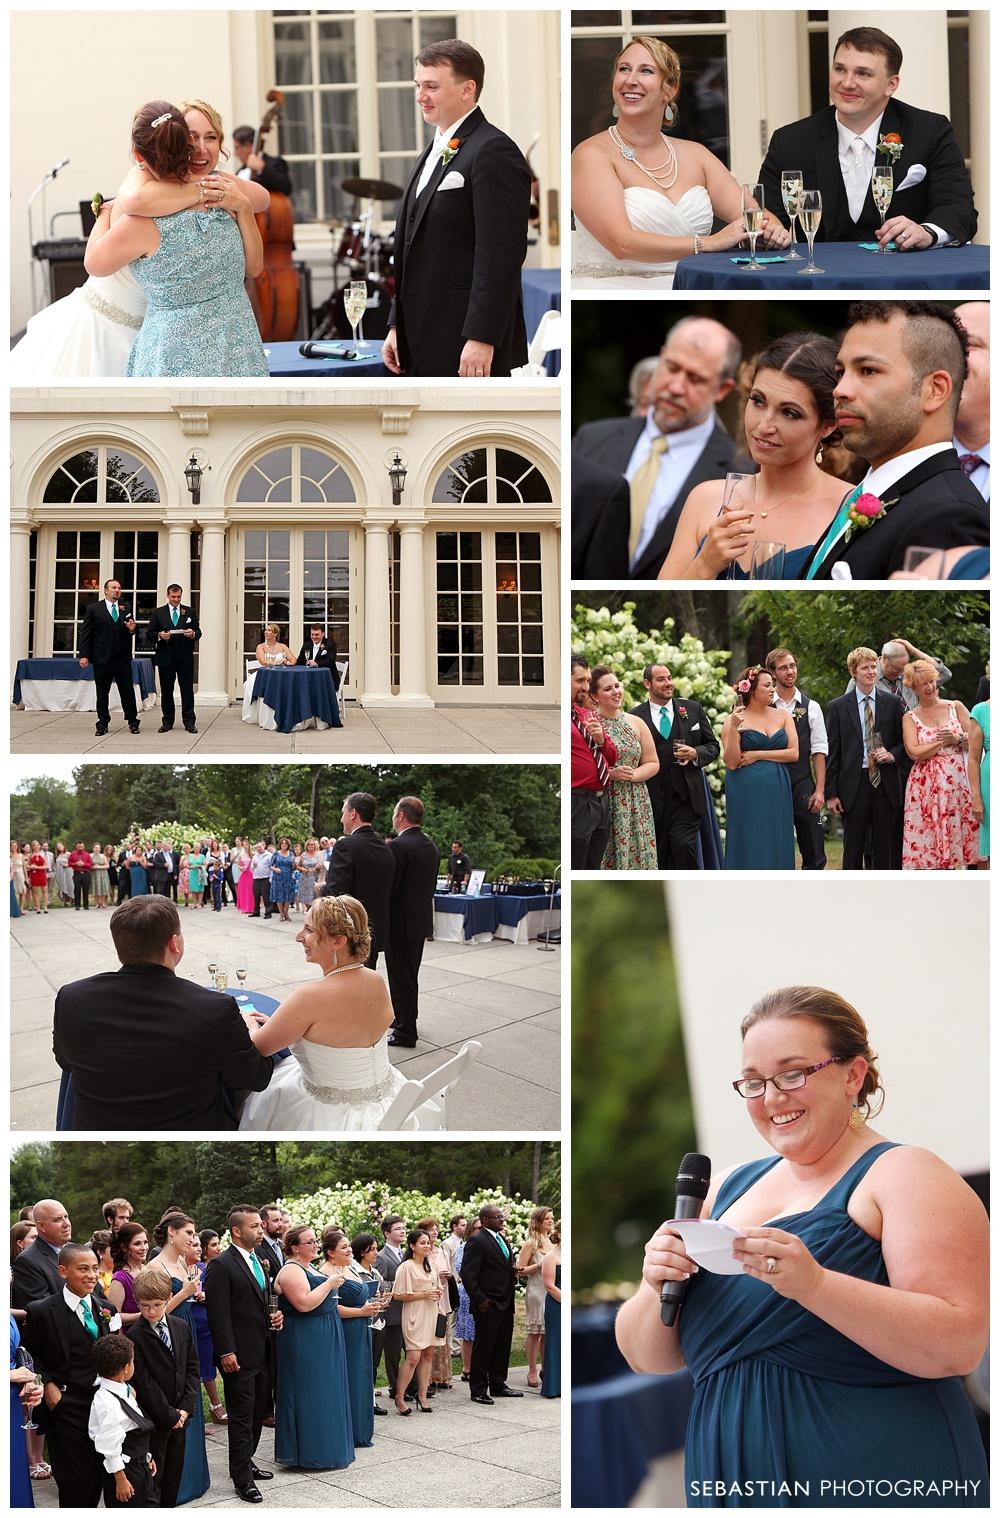 Sebastian_Photography_Wadsworth_Mansion_Wedding_Pictures_CT_53.jpg